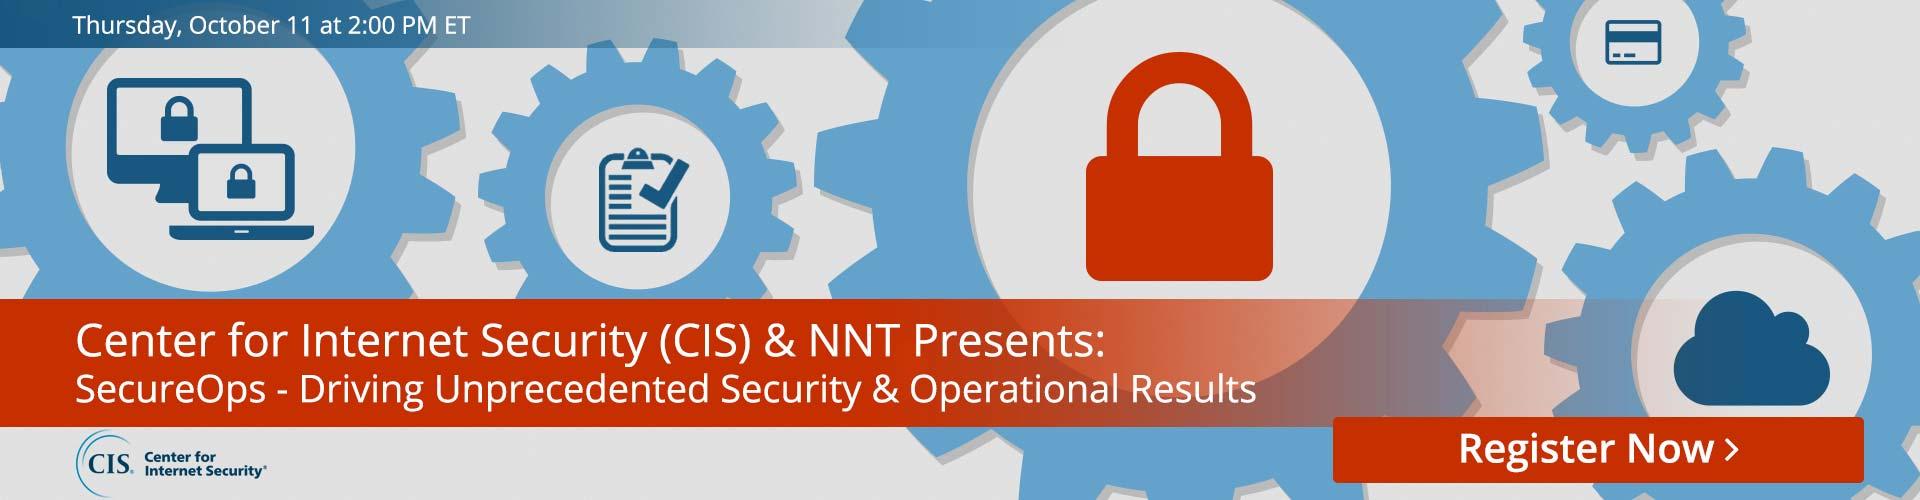 secureops-webinar